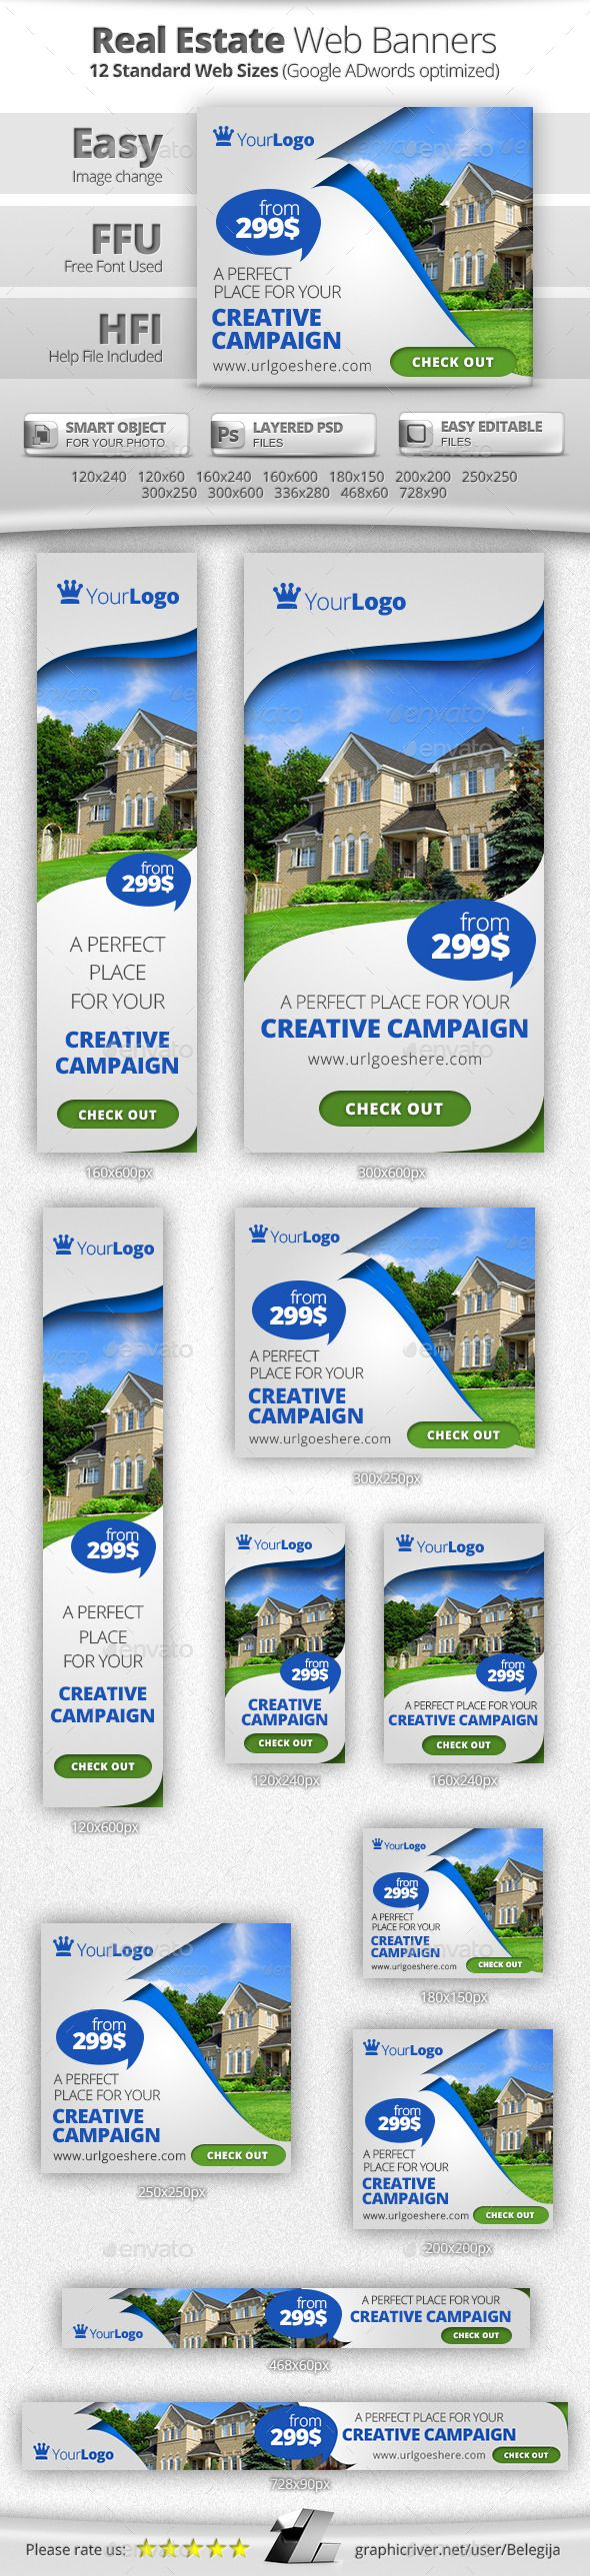 Real estate billboard design samples - Multipurpose Real Estate Web Banners